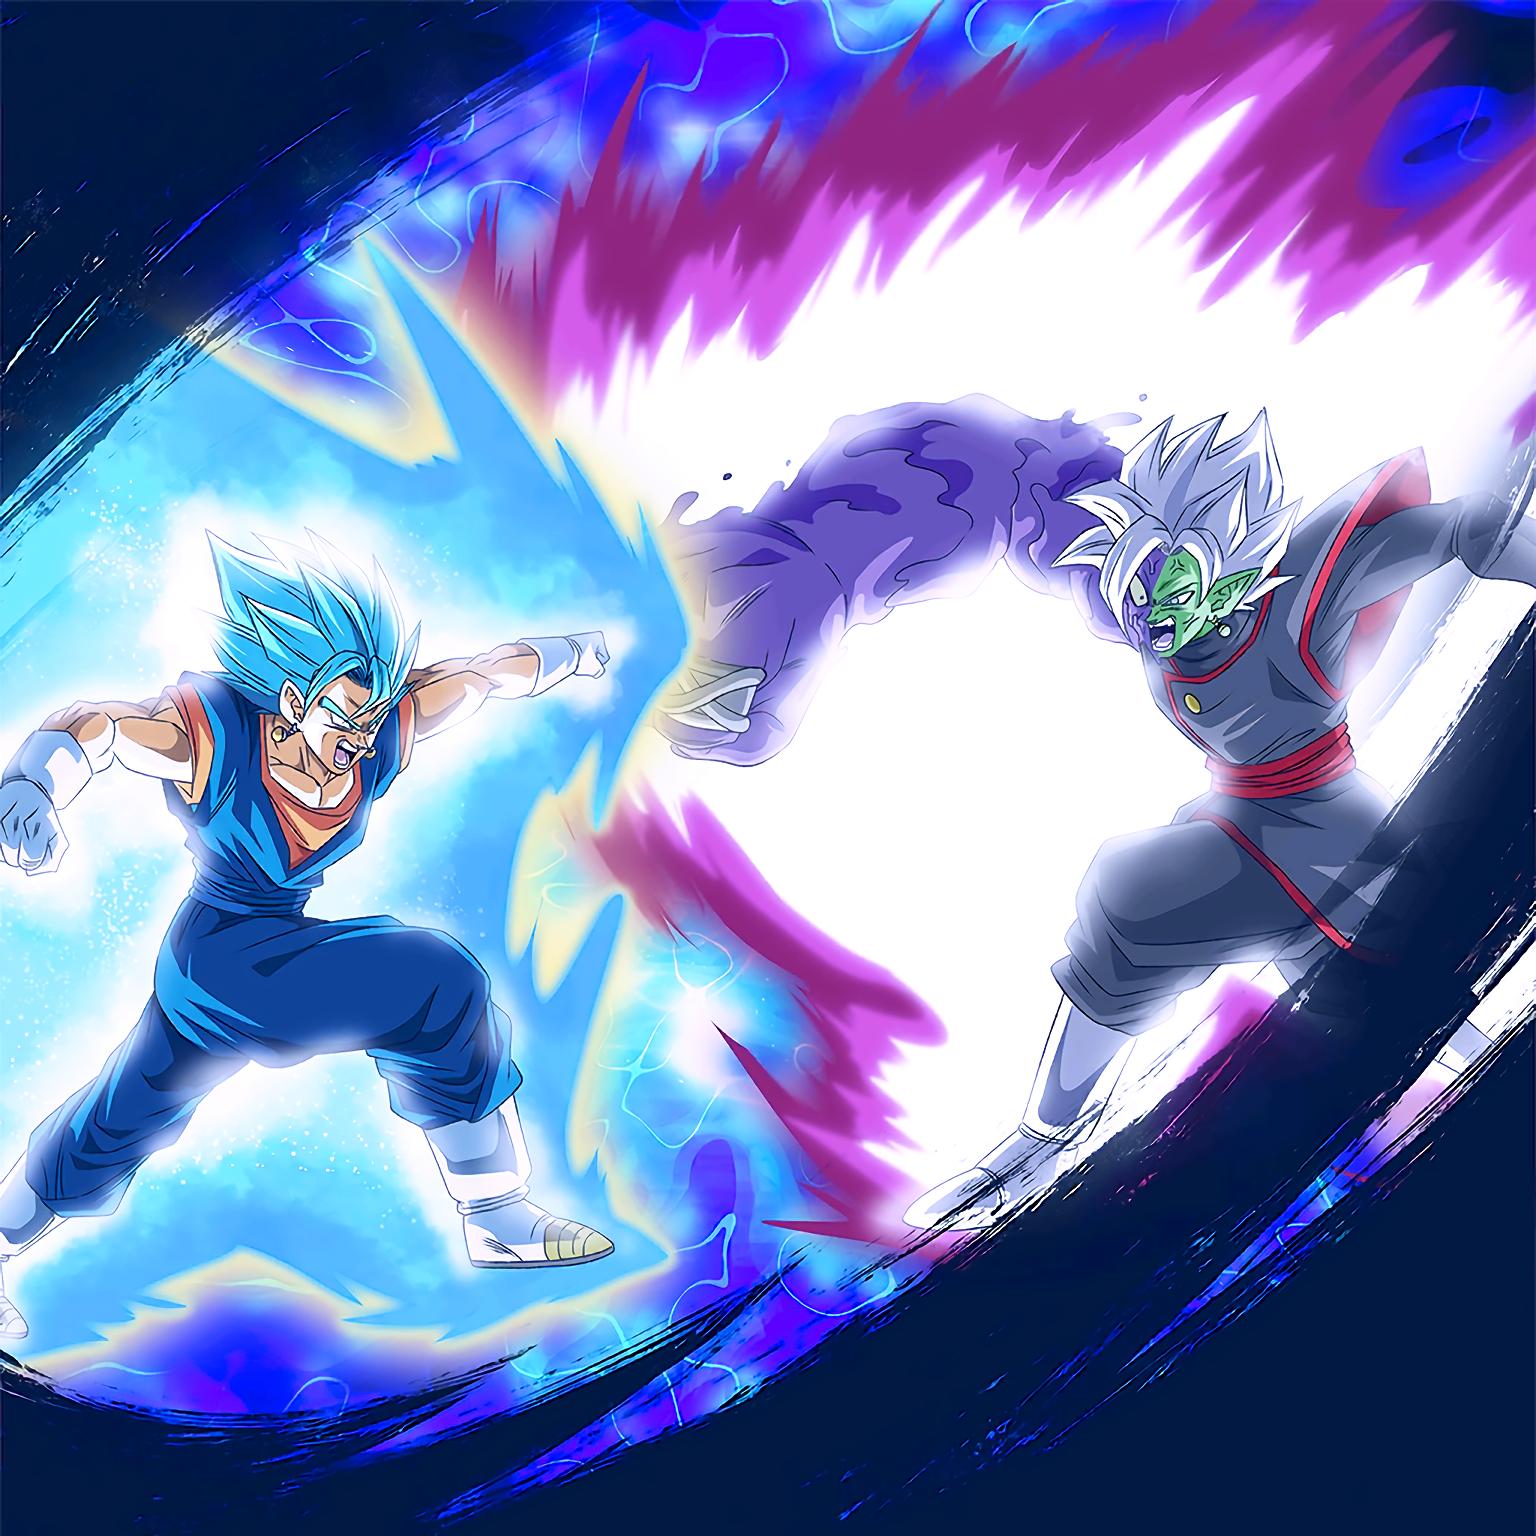 Vegito Vs Zamasu Wallpaper Db Legends By Maxiuchiha22 On Deviantart Anime Dragon Ball Super Dragon Ball Art Anime Dragon Ball